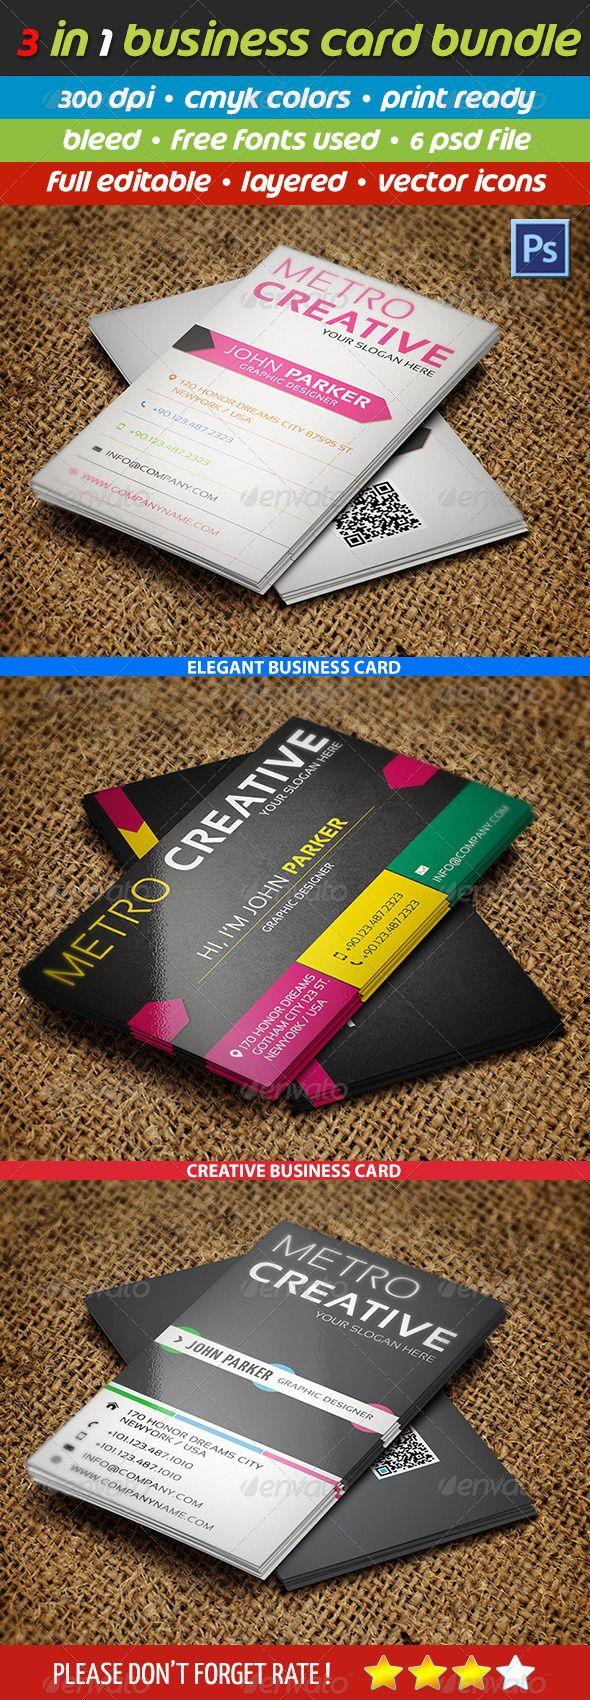 103 best Print Templates images on Pinterest | Print templates, Font ...